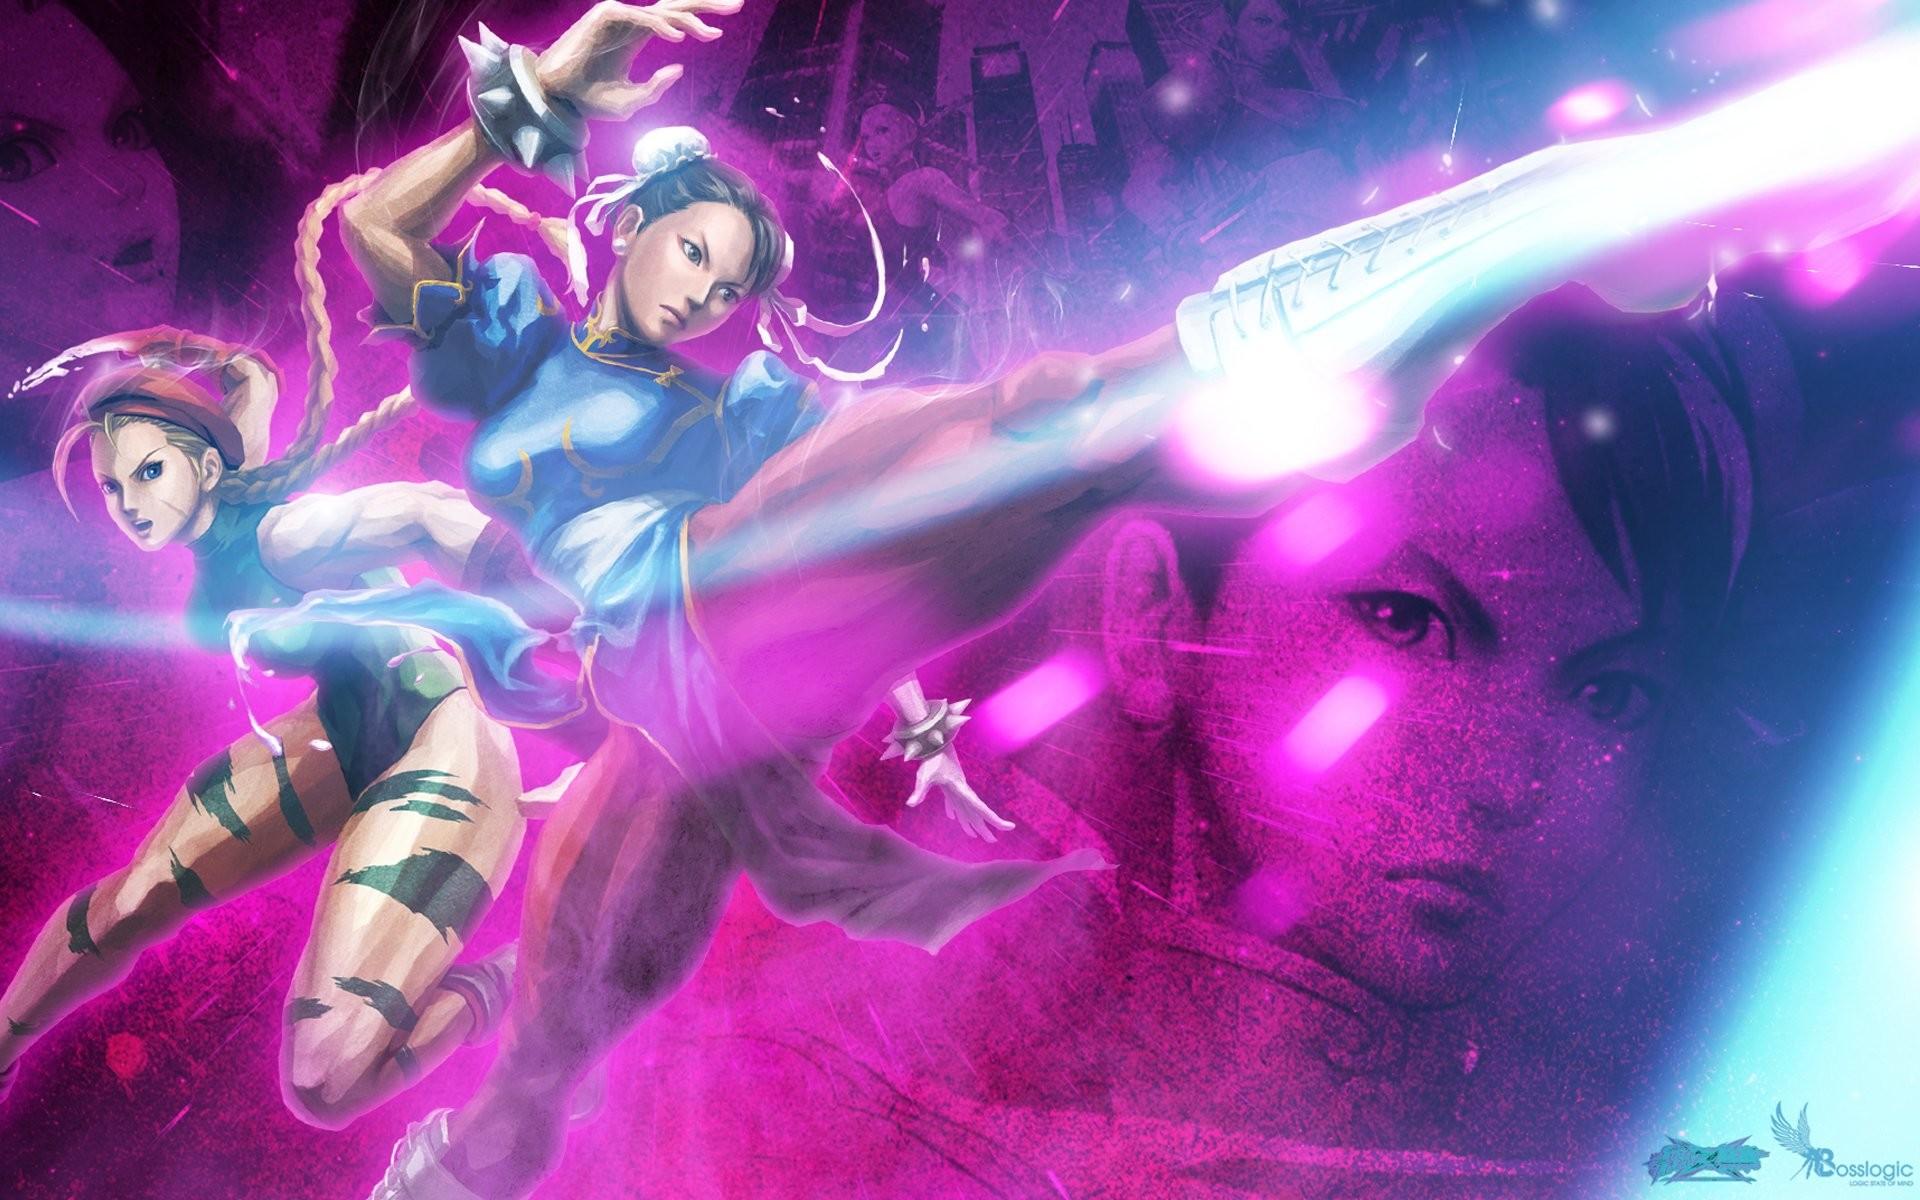 Street Fighter X Tekken Chun Li And Cammy 804685 …